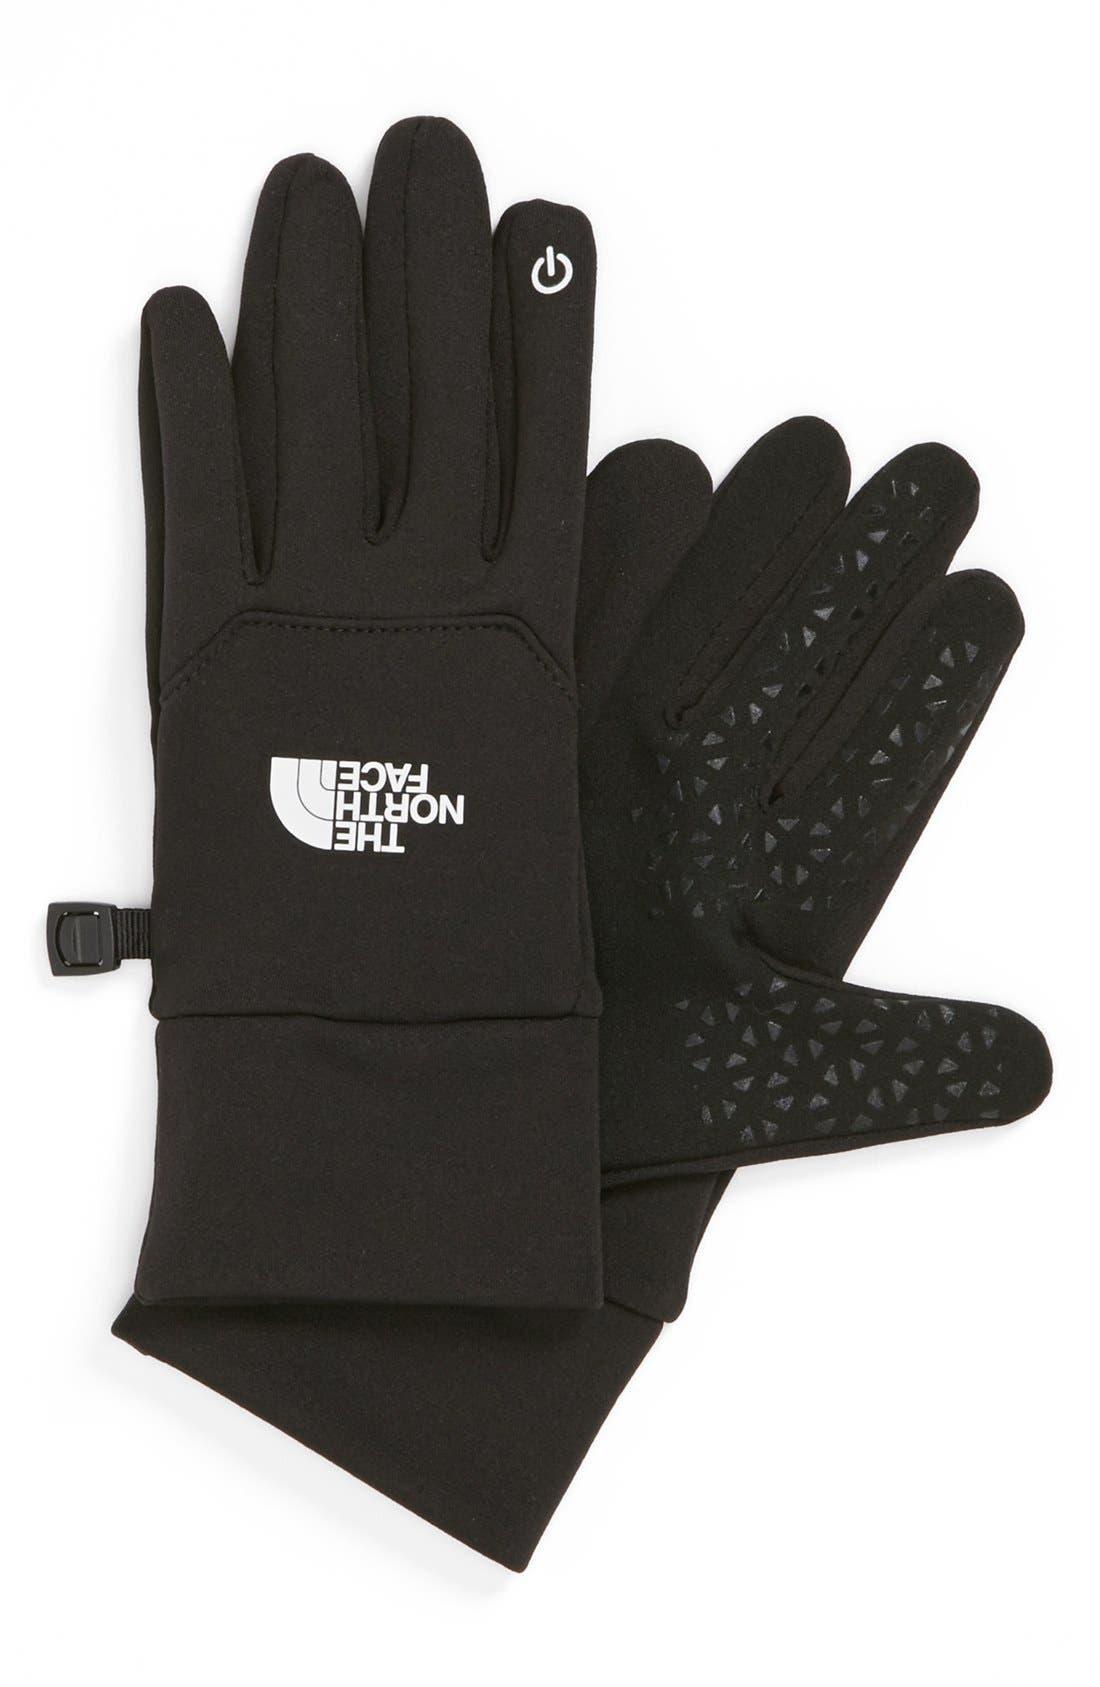 The North Face 'E-Tip' Glove (Regular Retail Price: $45.00)